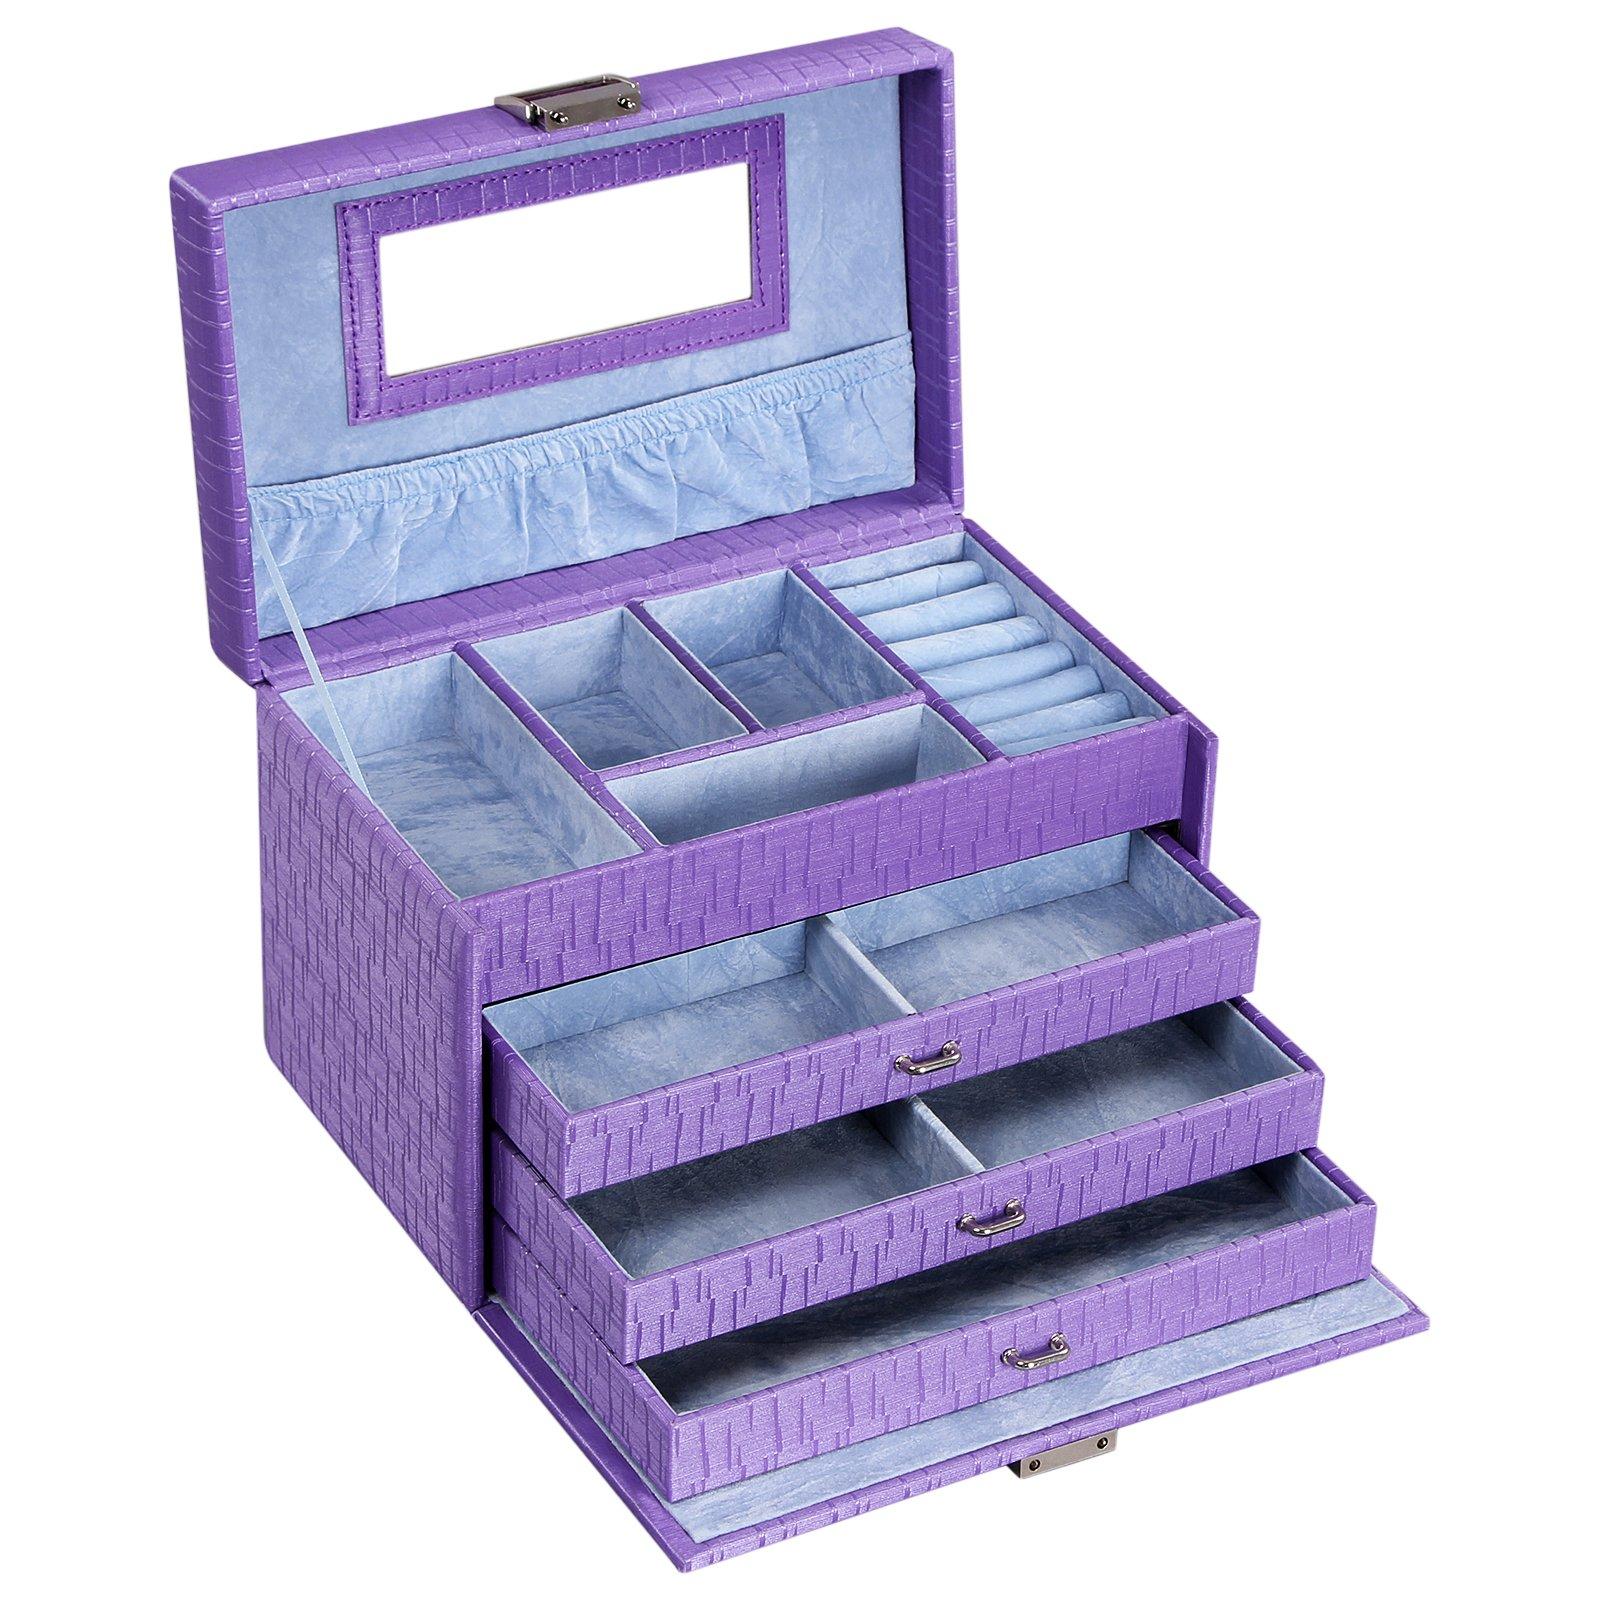 SONGMICS Girls Jewelry Box Lockable Jewelry Case Purple Textured Organizer UJBC133